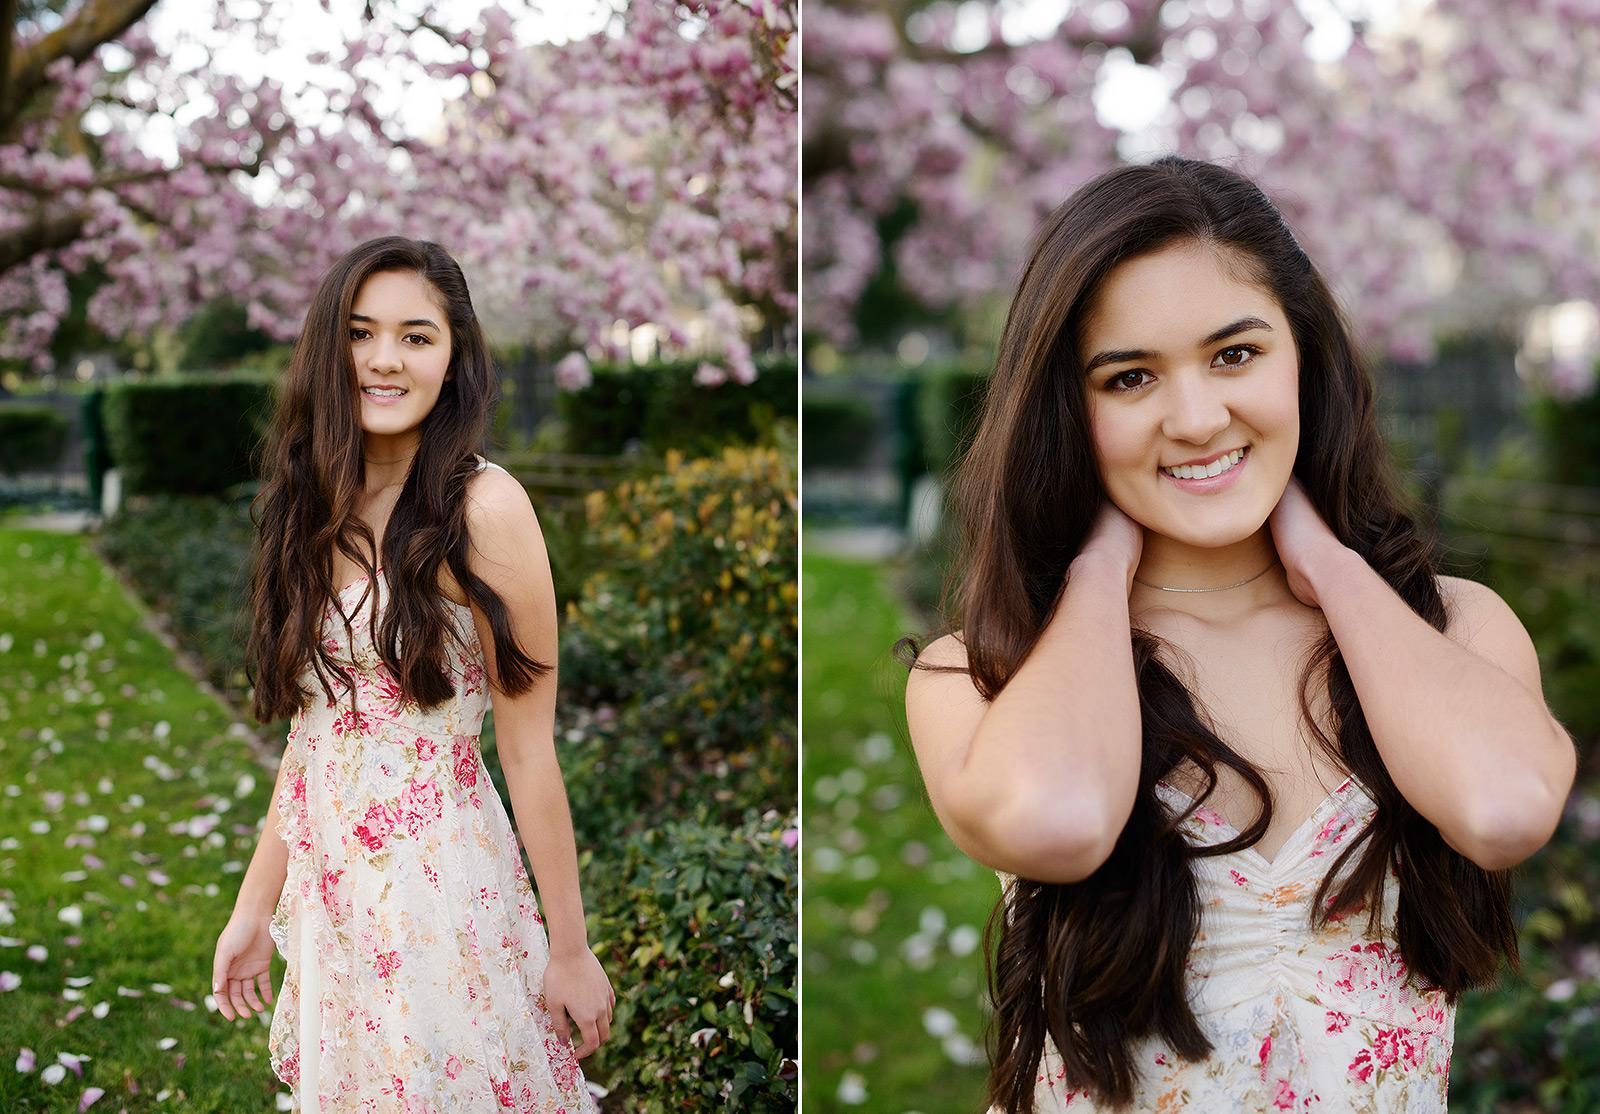 natural poses for spring senior portraits floral magnolia pink tree